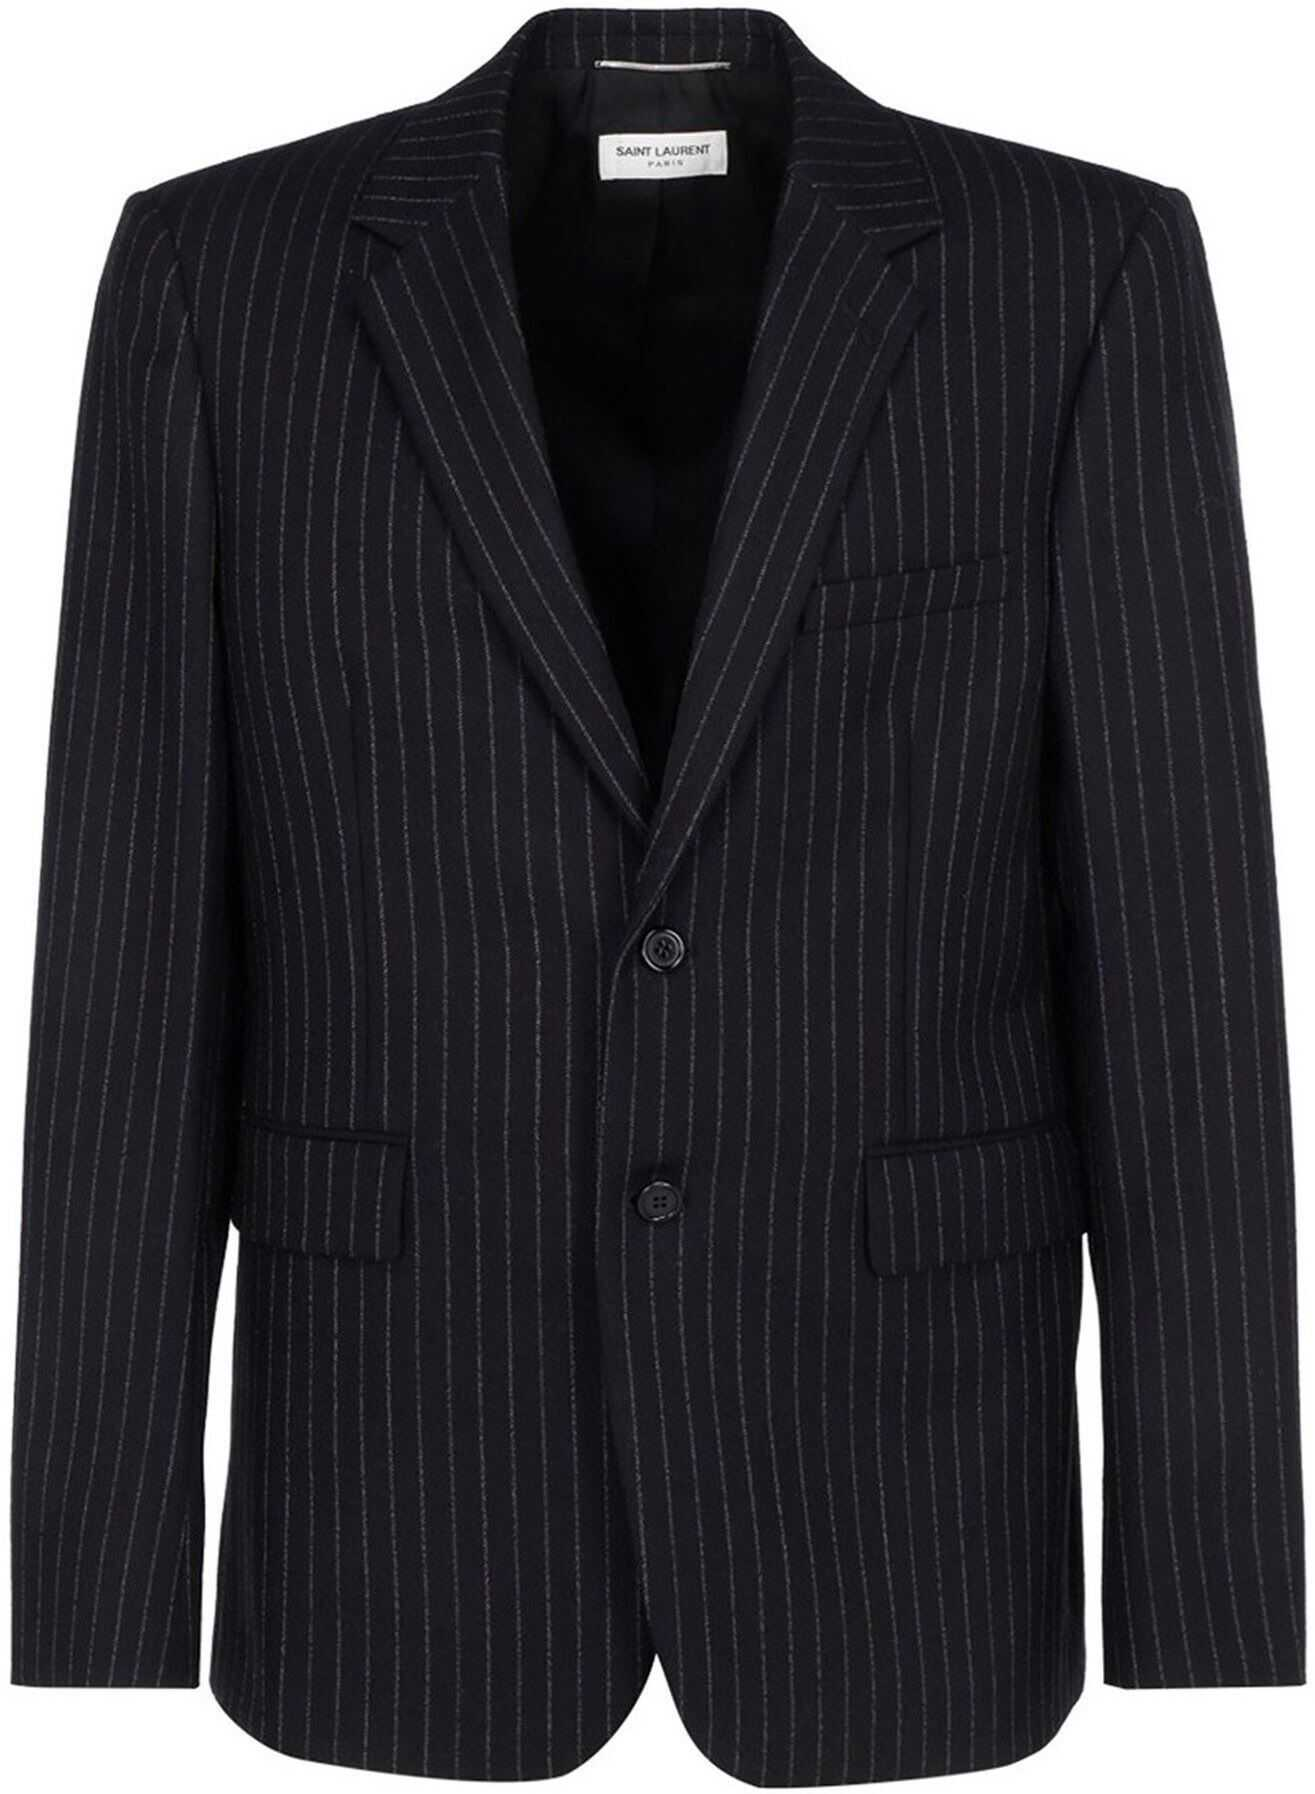 Saint Laurent Pinstriped Wool Blazer In Black Black imagine